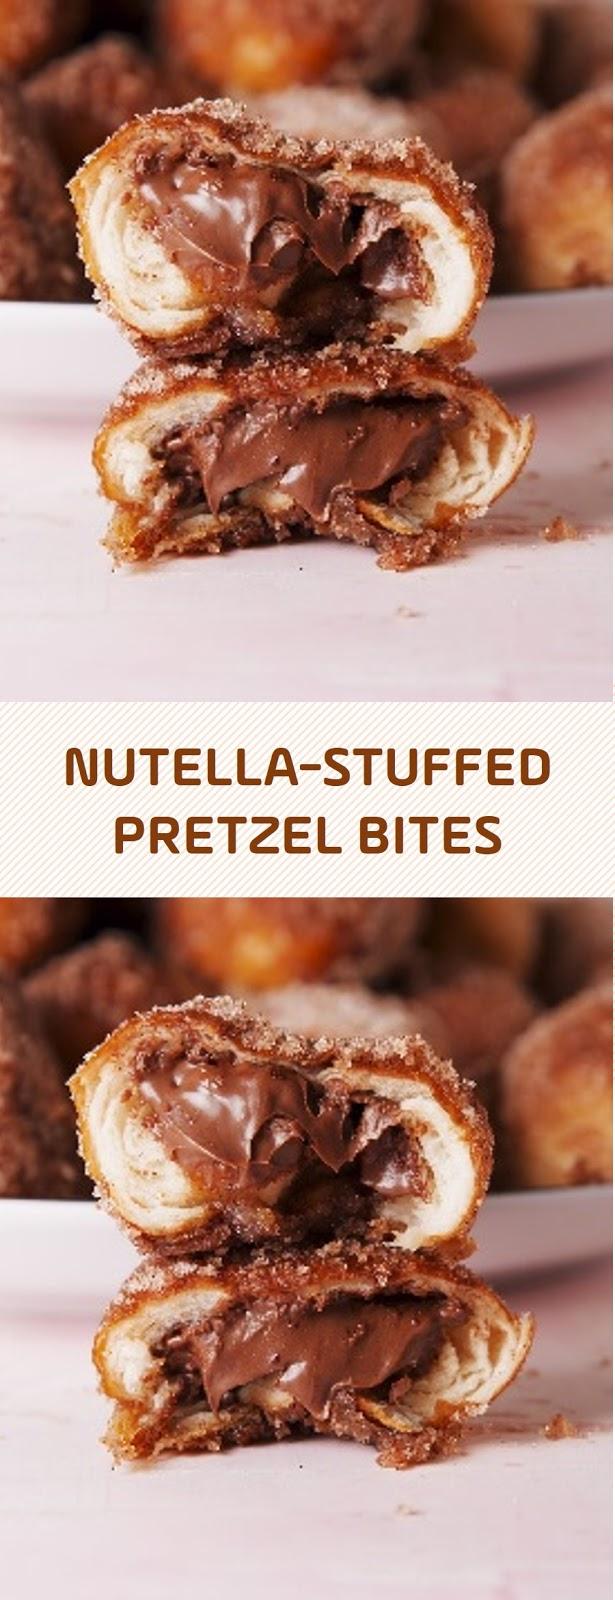 Nutella-Stuffed Pretzel Bites